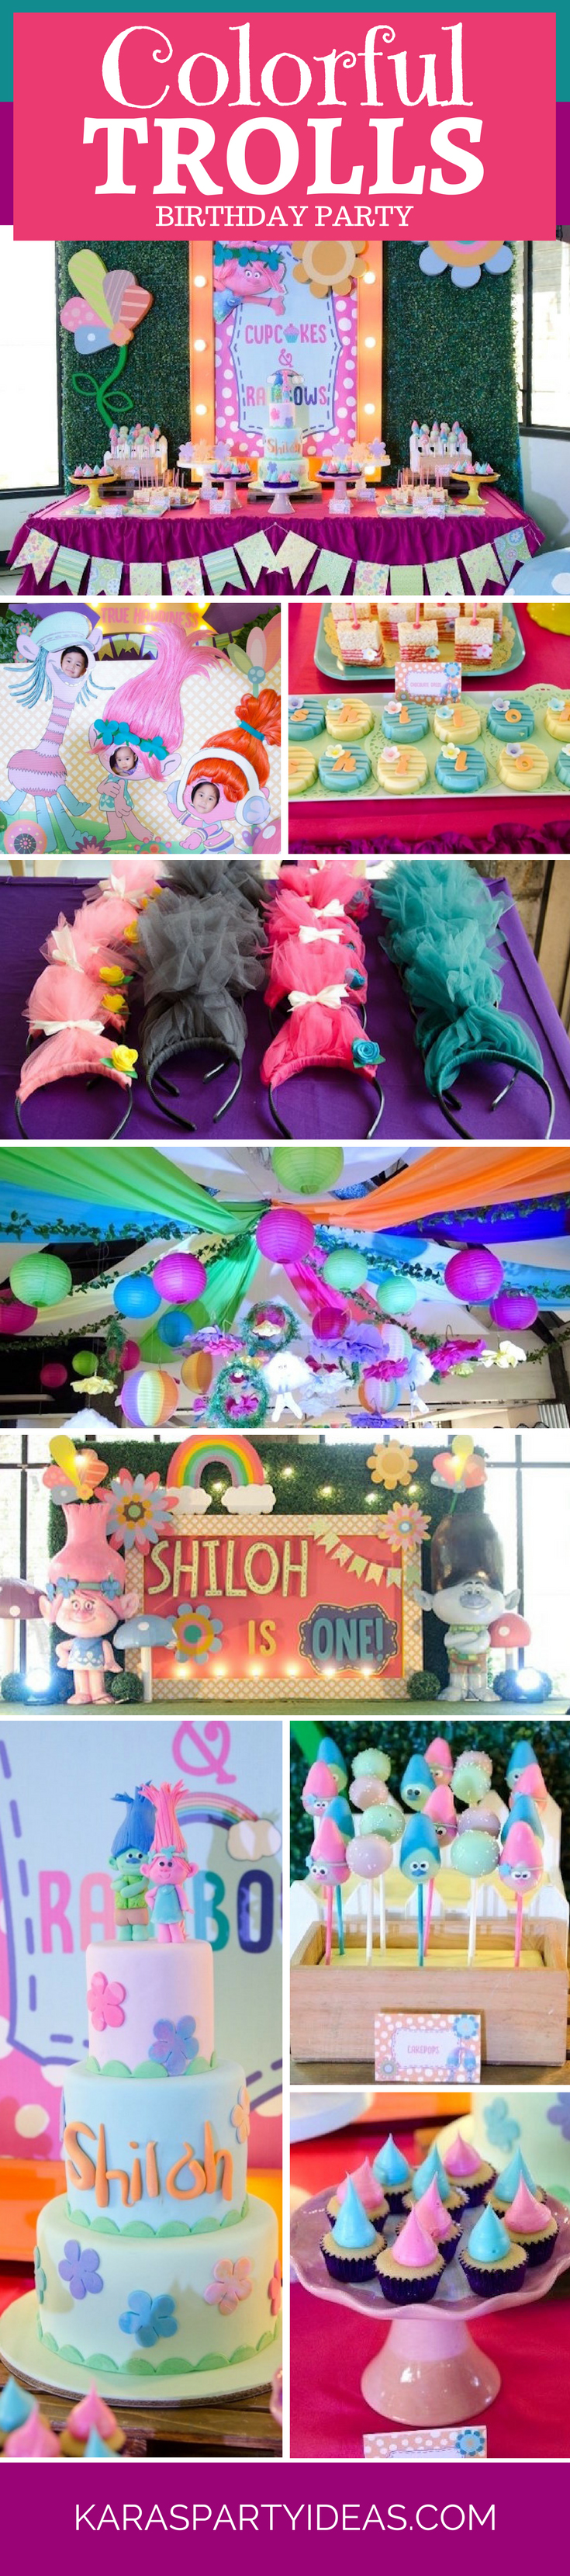 Colorful Trolls Birthday Party via Kara's Party Ideas